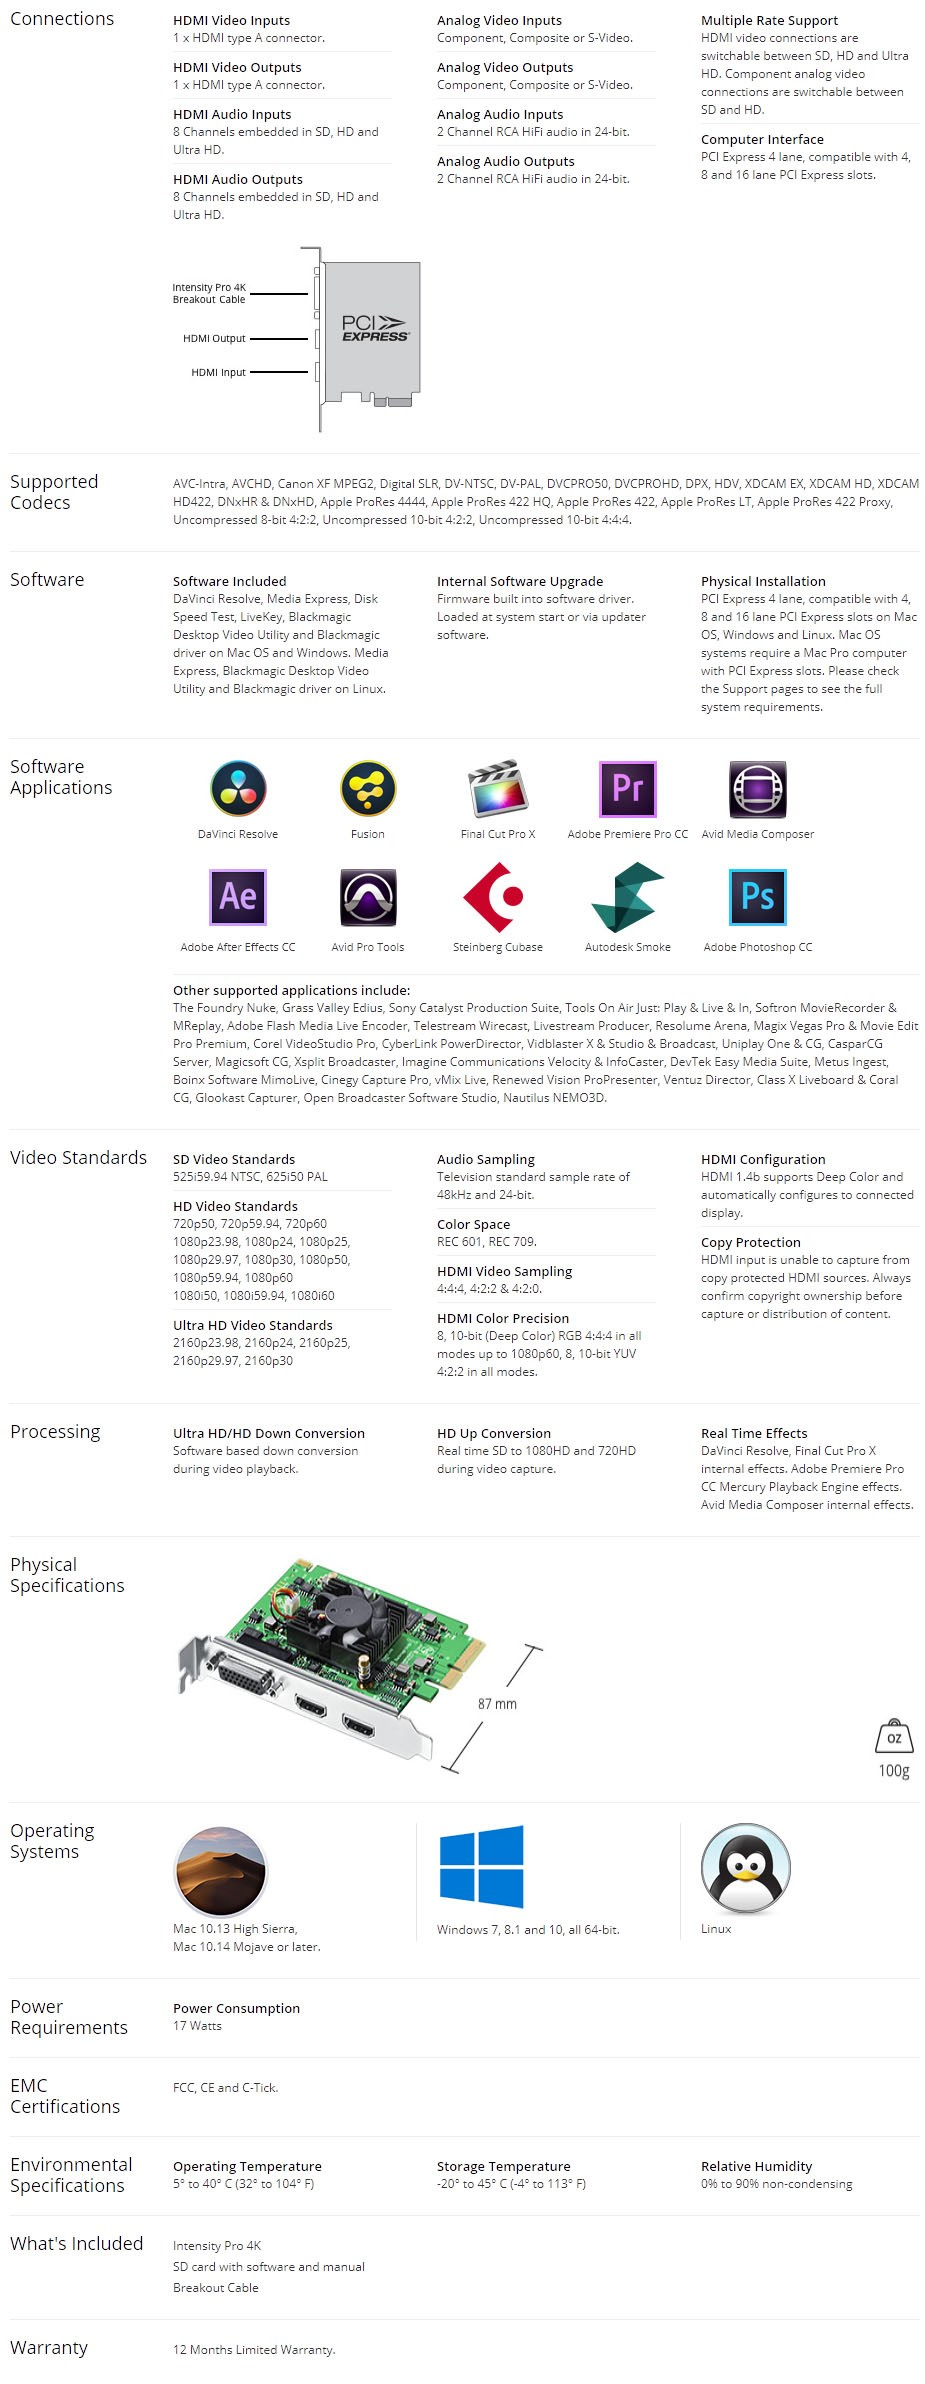 Blackmagic Design Intensity Pro 4K Capture/Playback Card - Overview 2